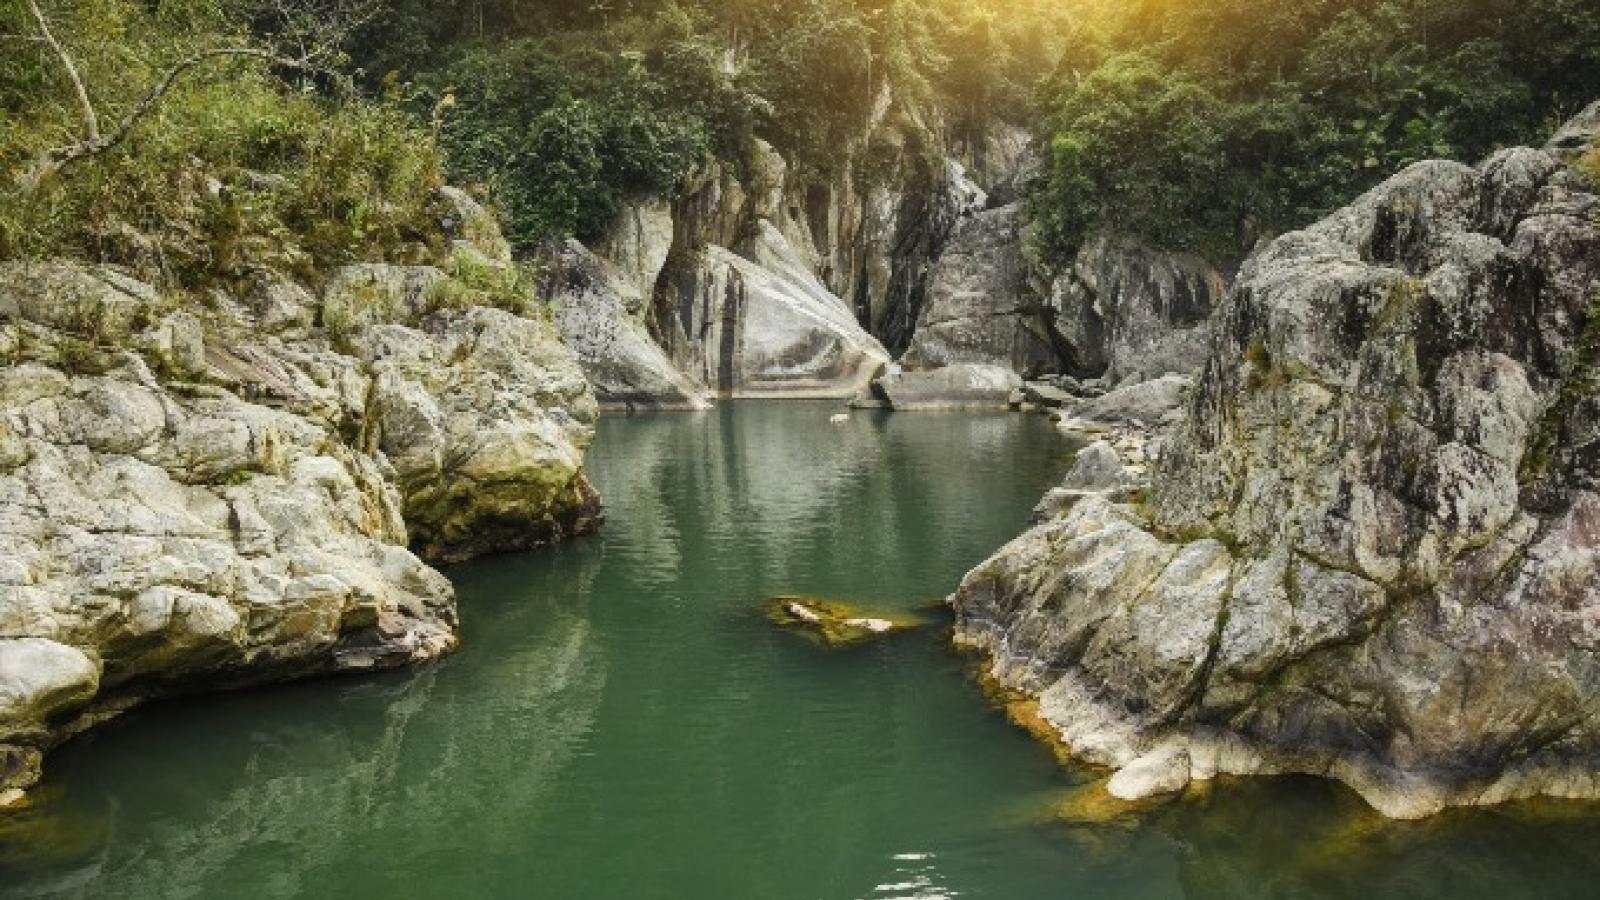 National Geographic lists Vietnam mountain range among world's best destinations